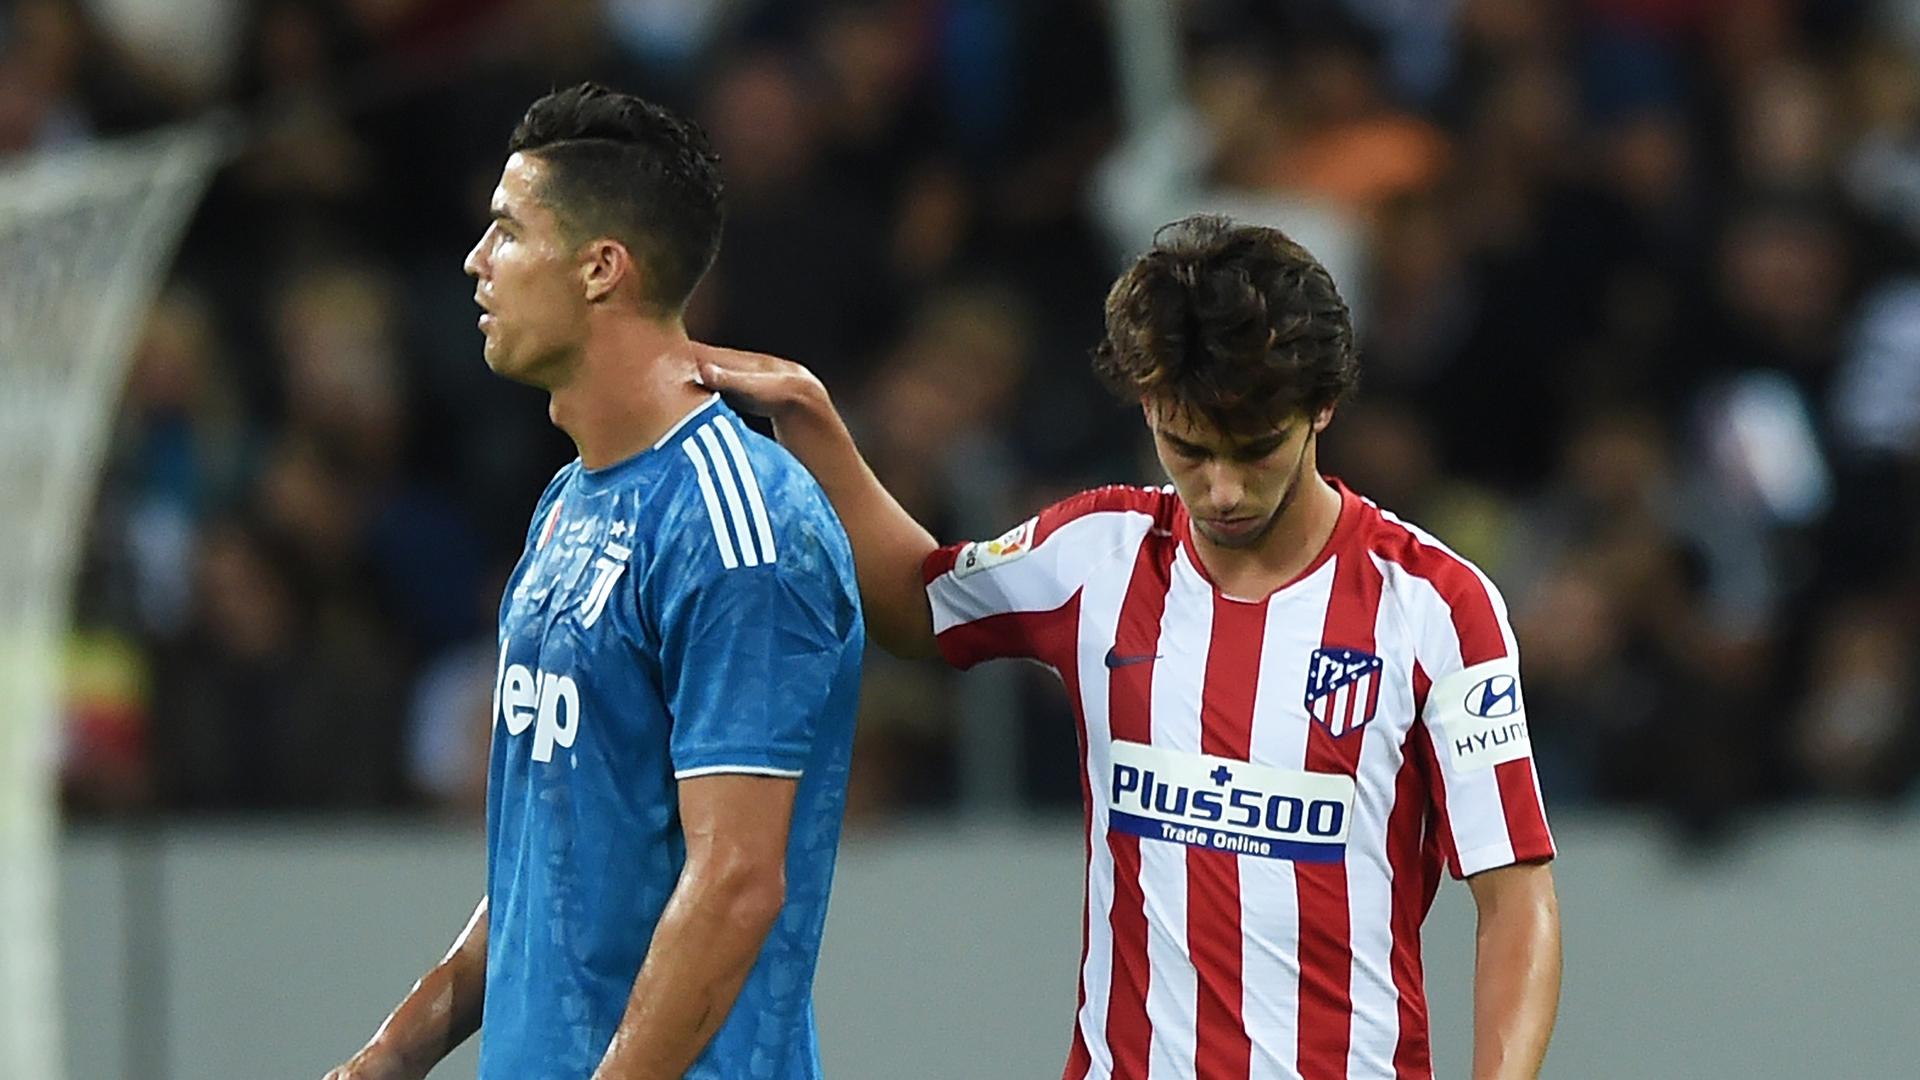 Atlético-Juve : Quand Joao Felix se mesure à son idole Cristiano Ronaldo